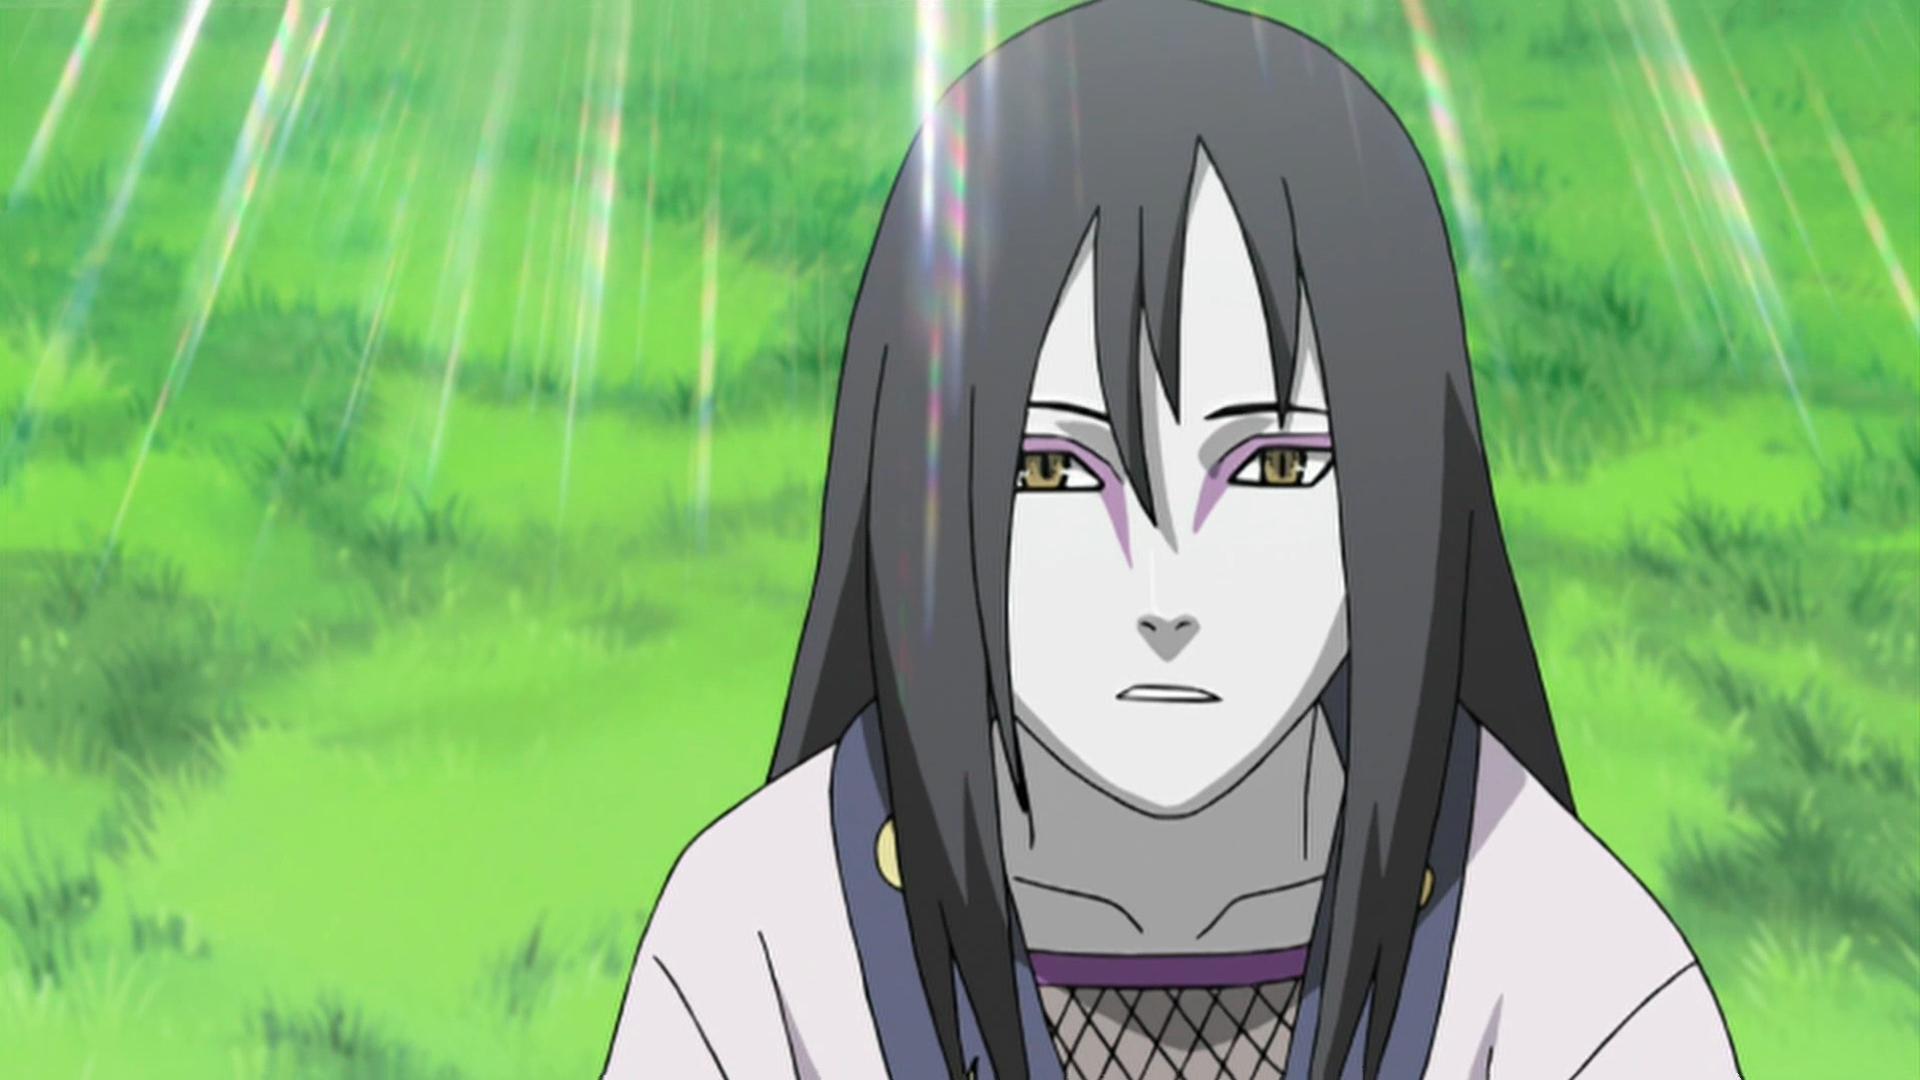 Naruto Chunnin Exams Tournament Gaara And Rock Lee Vs Kimimaro